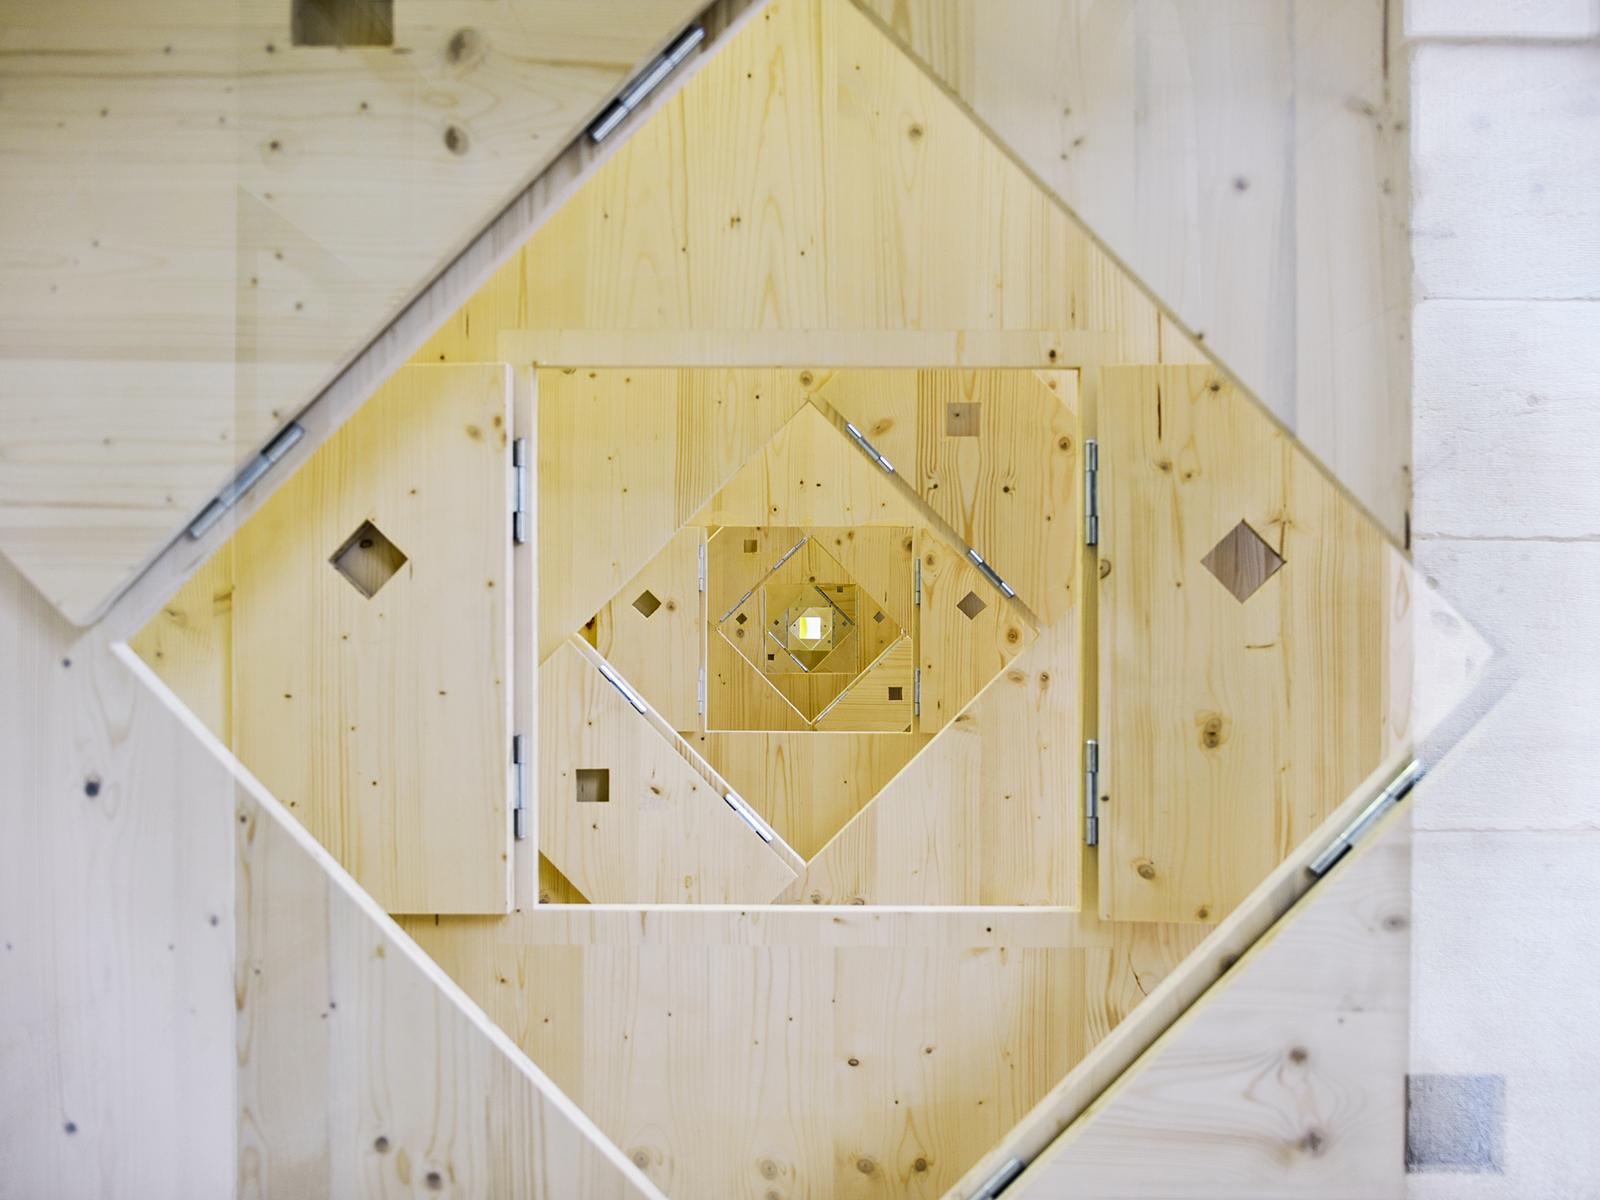 Benoit-Delaunay-artiste-installations-Un Sentiment de Chaleur-16